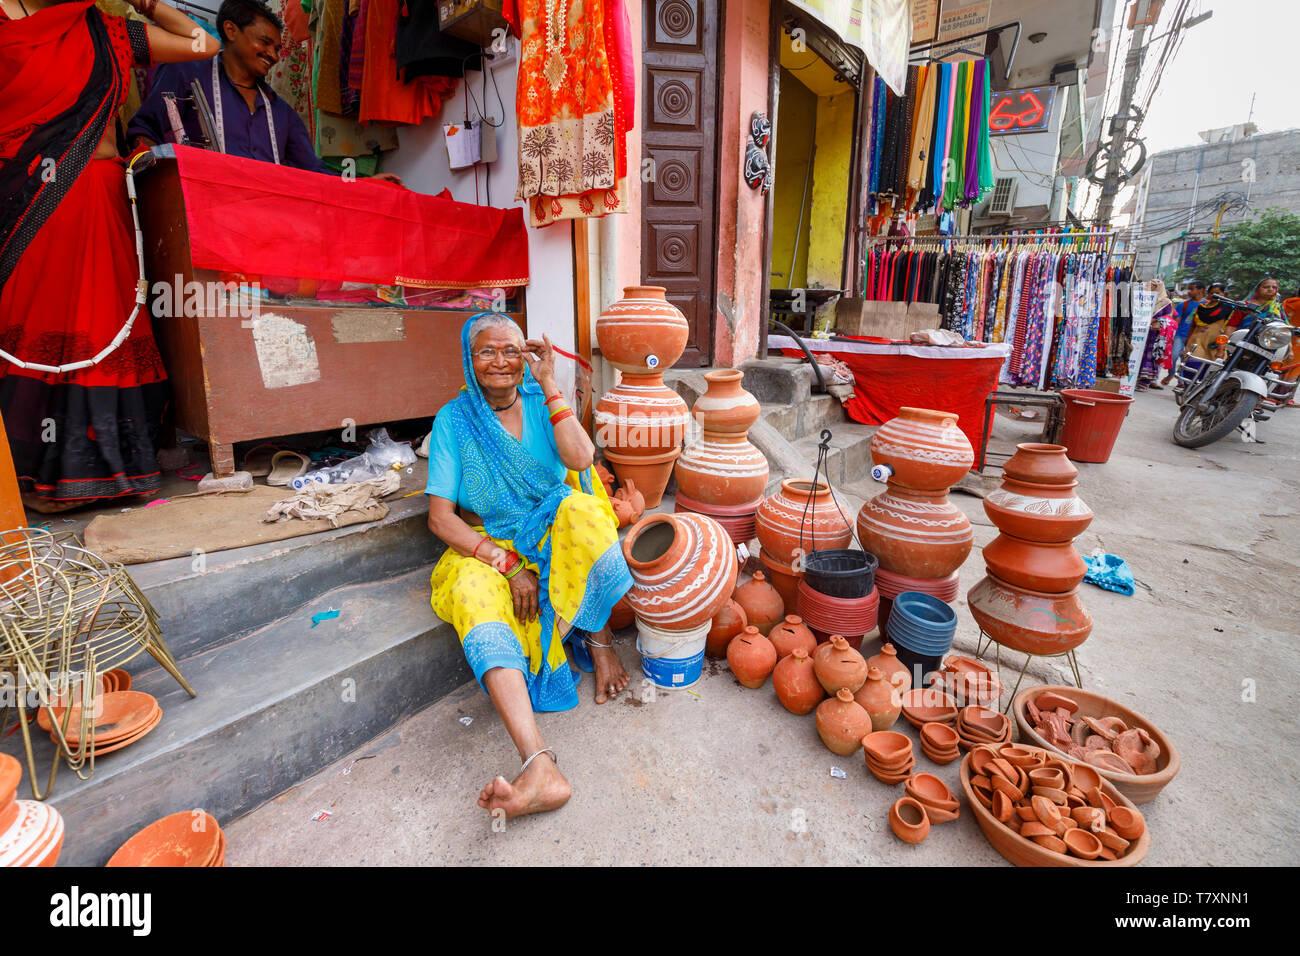 official photos 2a2e8 dce02 Street Scene, Mahipalpur district, New Delhi Suburb: Eine ...